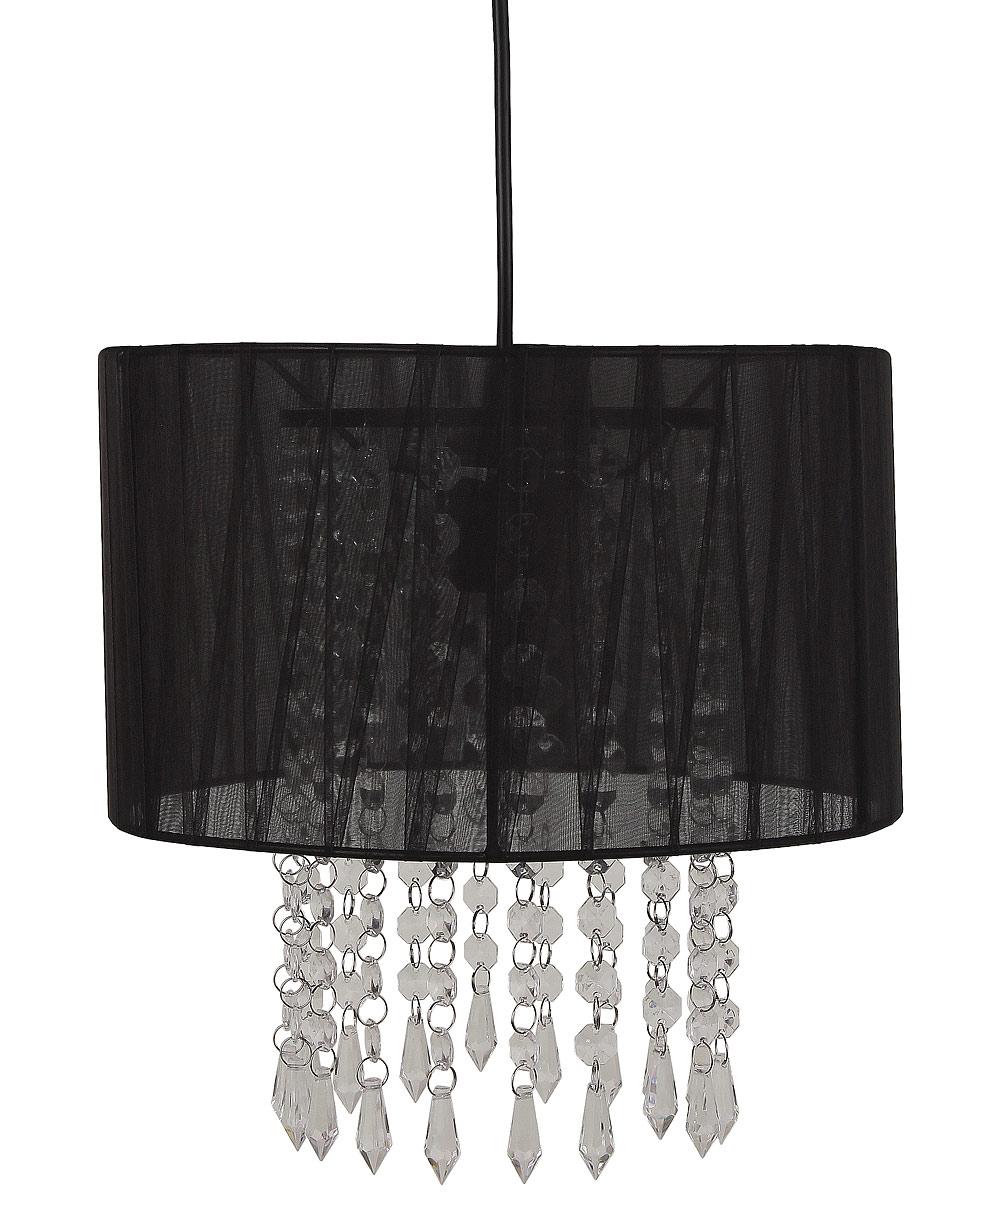 a7e876989fa5d Lampa sufitowa wisząca czarna glamour żyrandol 6951593053 - Allegro.pl